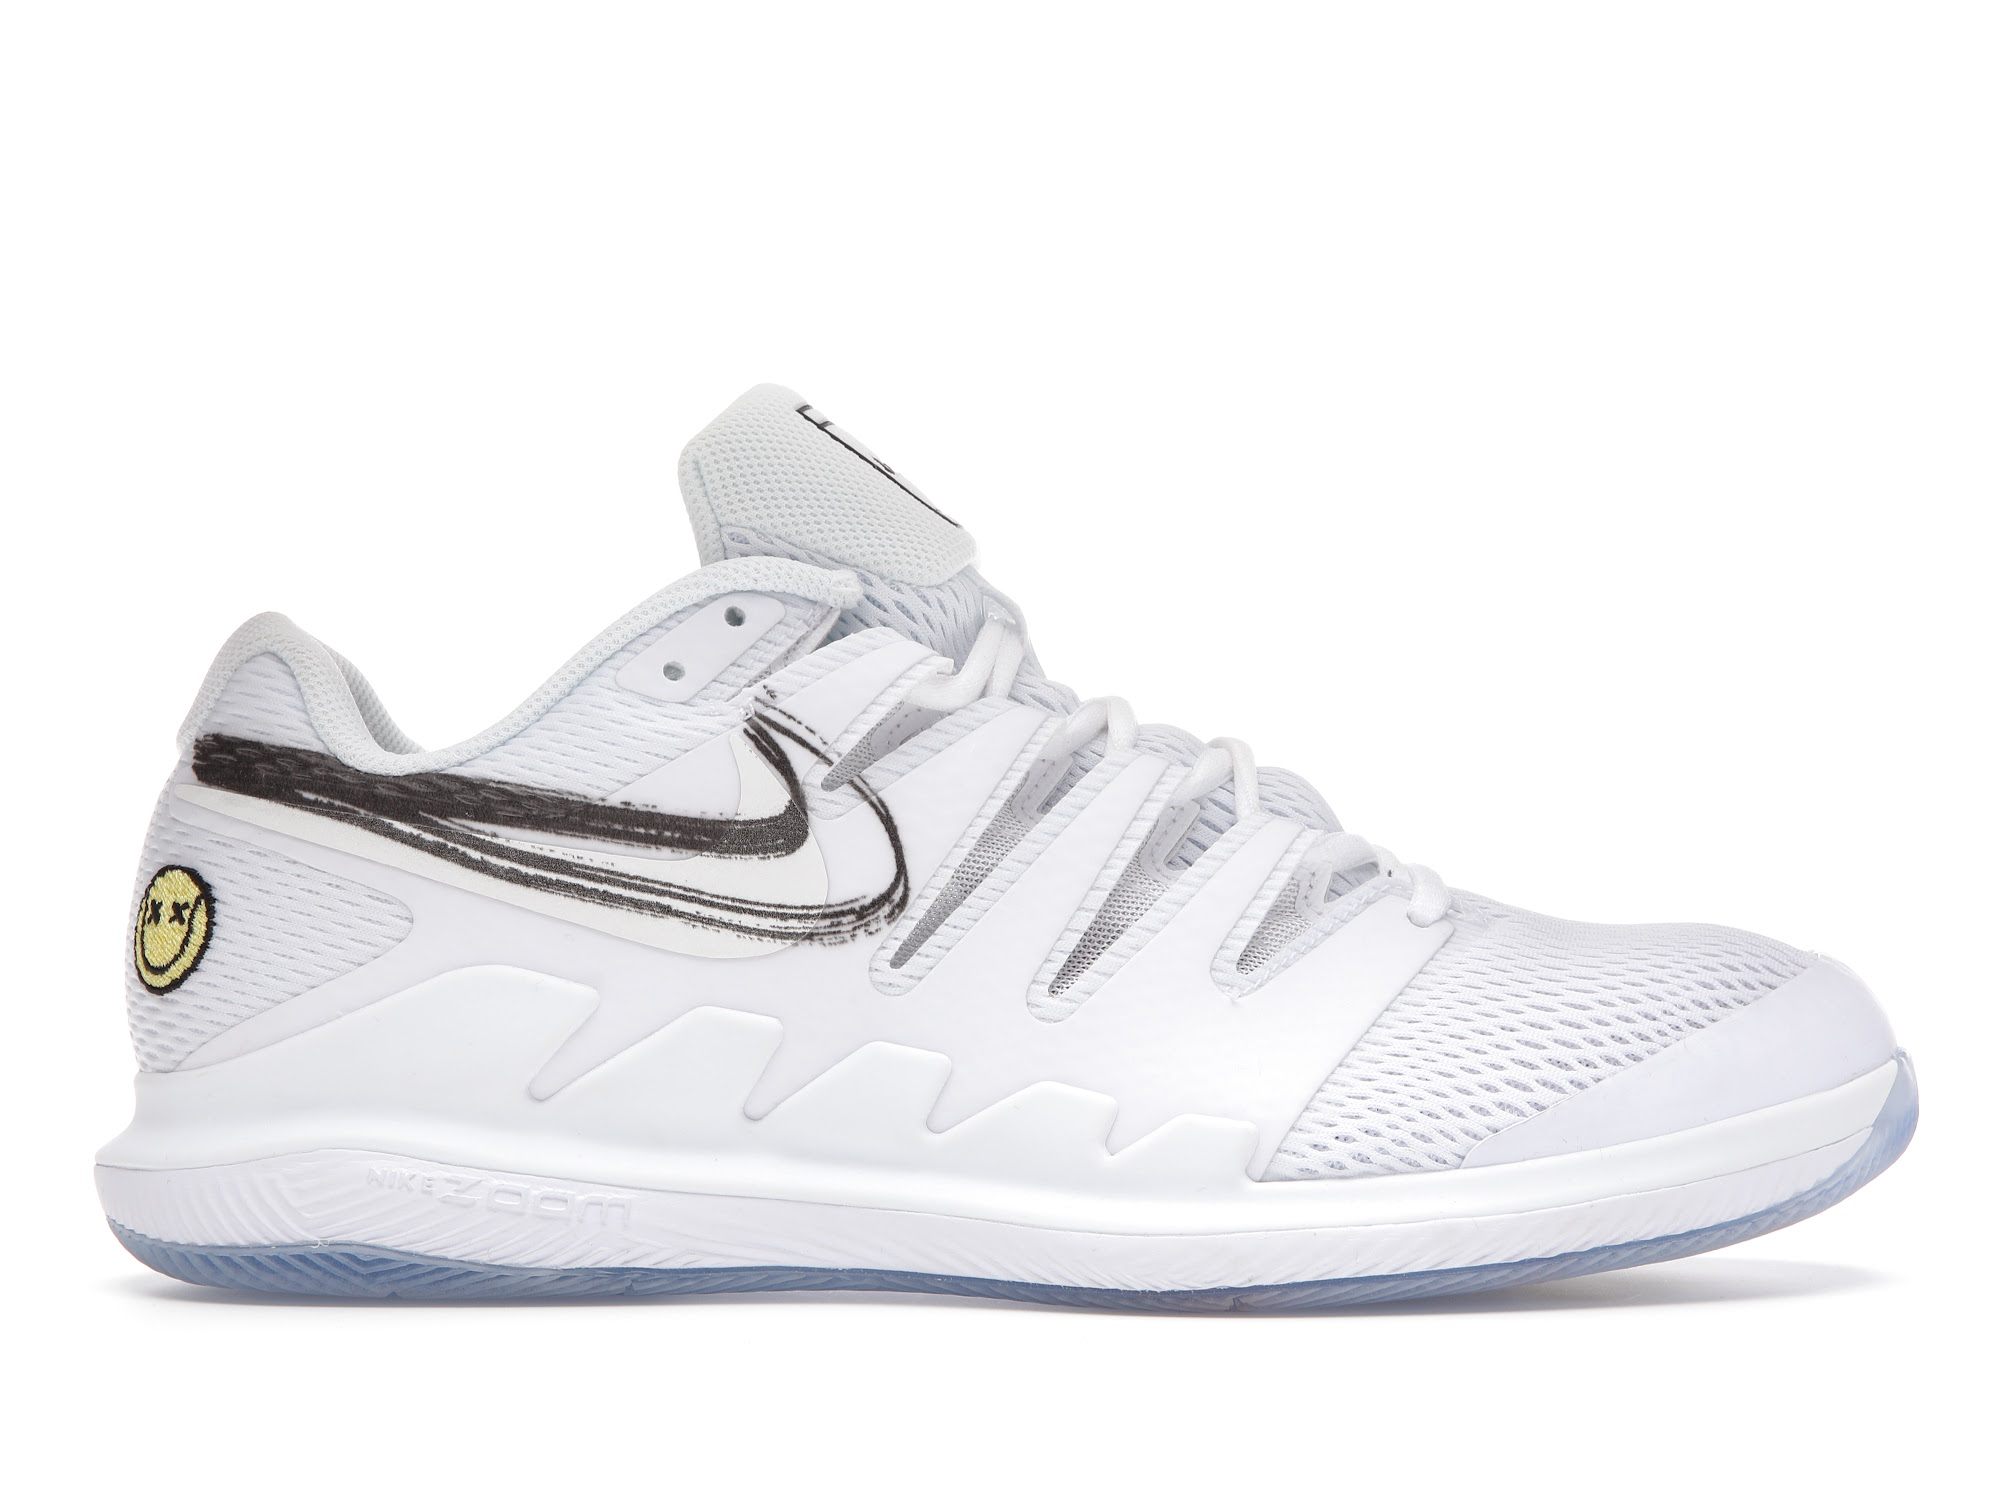 Nike Air Zoom Vapor X White Canary - AA8030-104